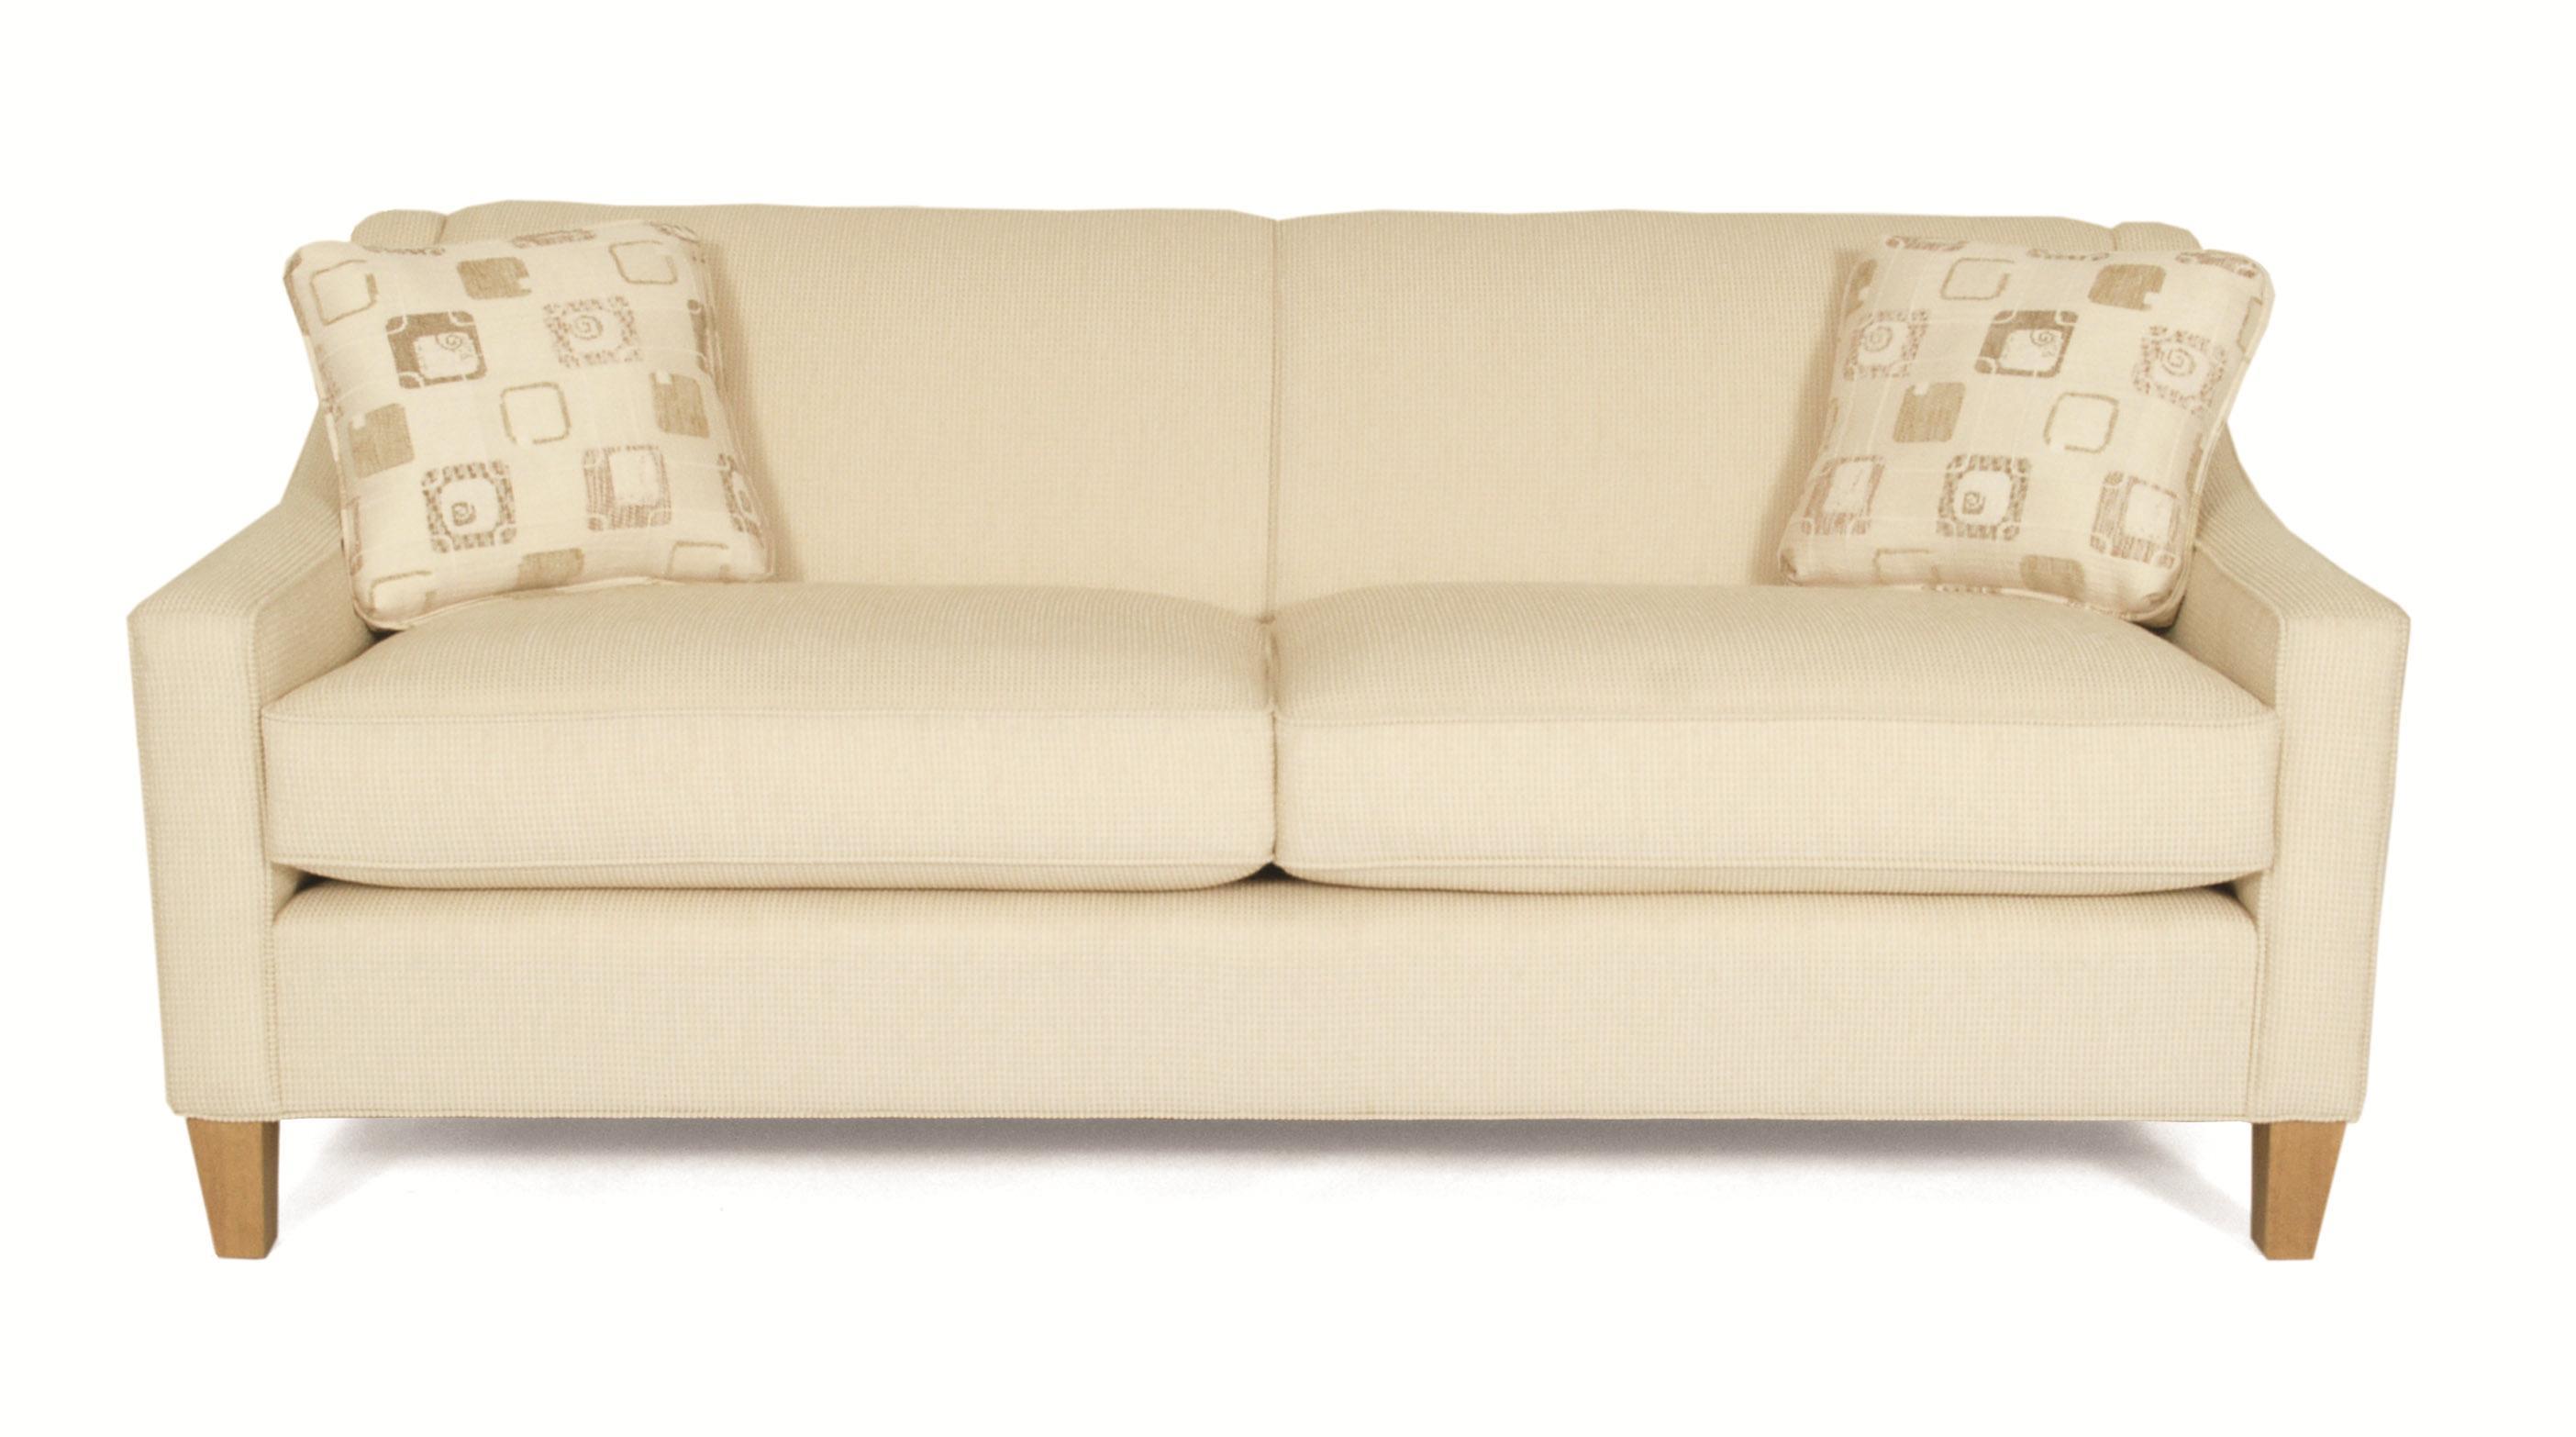 Blake Standard Sofa by Norwalk at Saugerties Furniture Mart